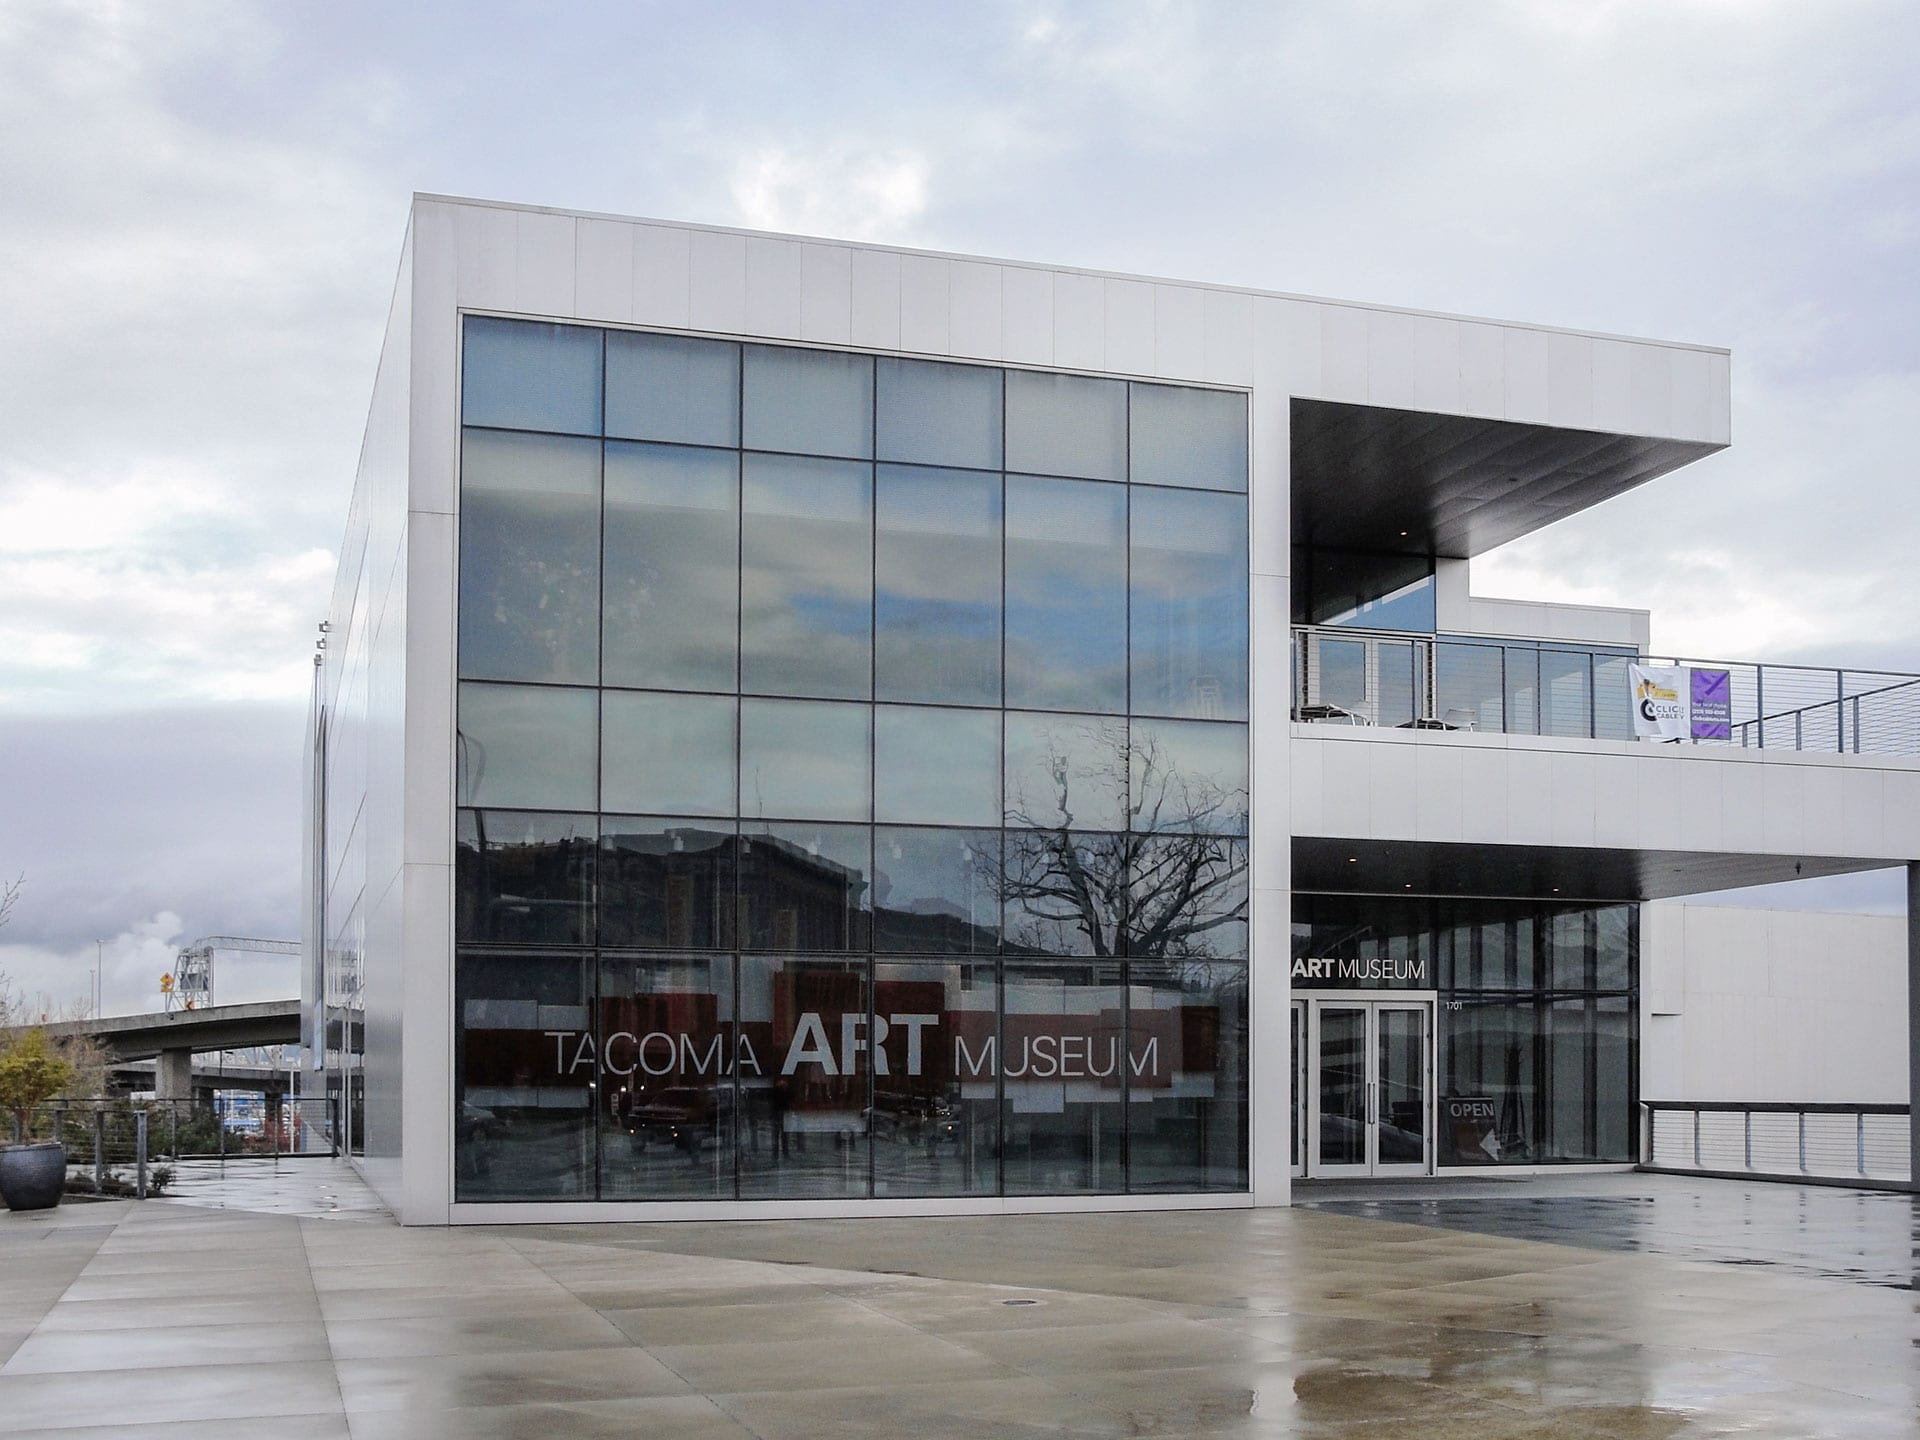 The Tacoma Art Museum in downtown Tacoma, Washington.